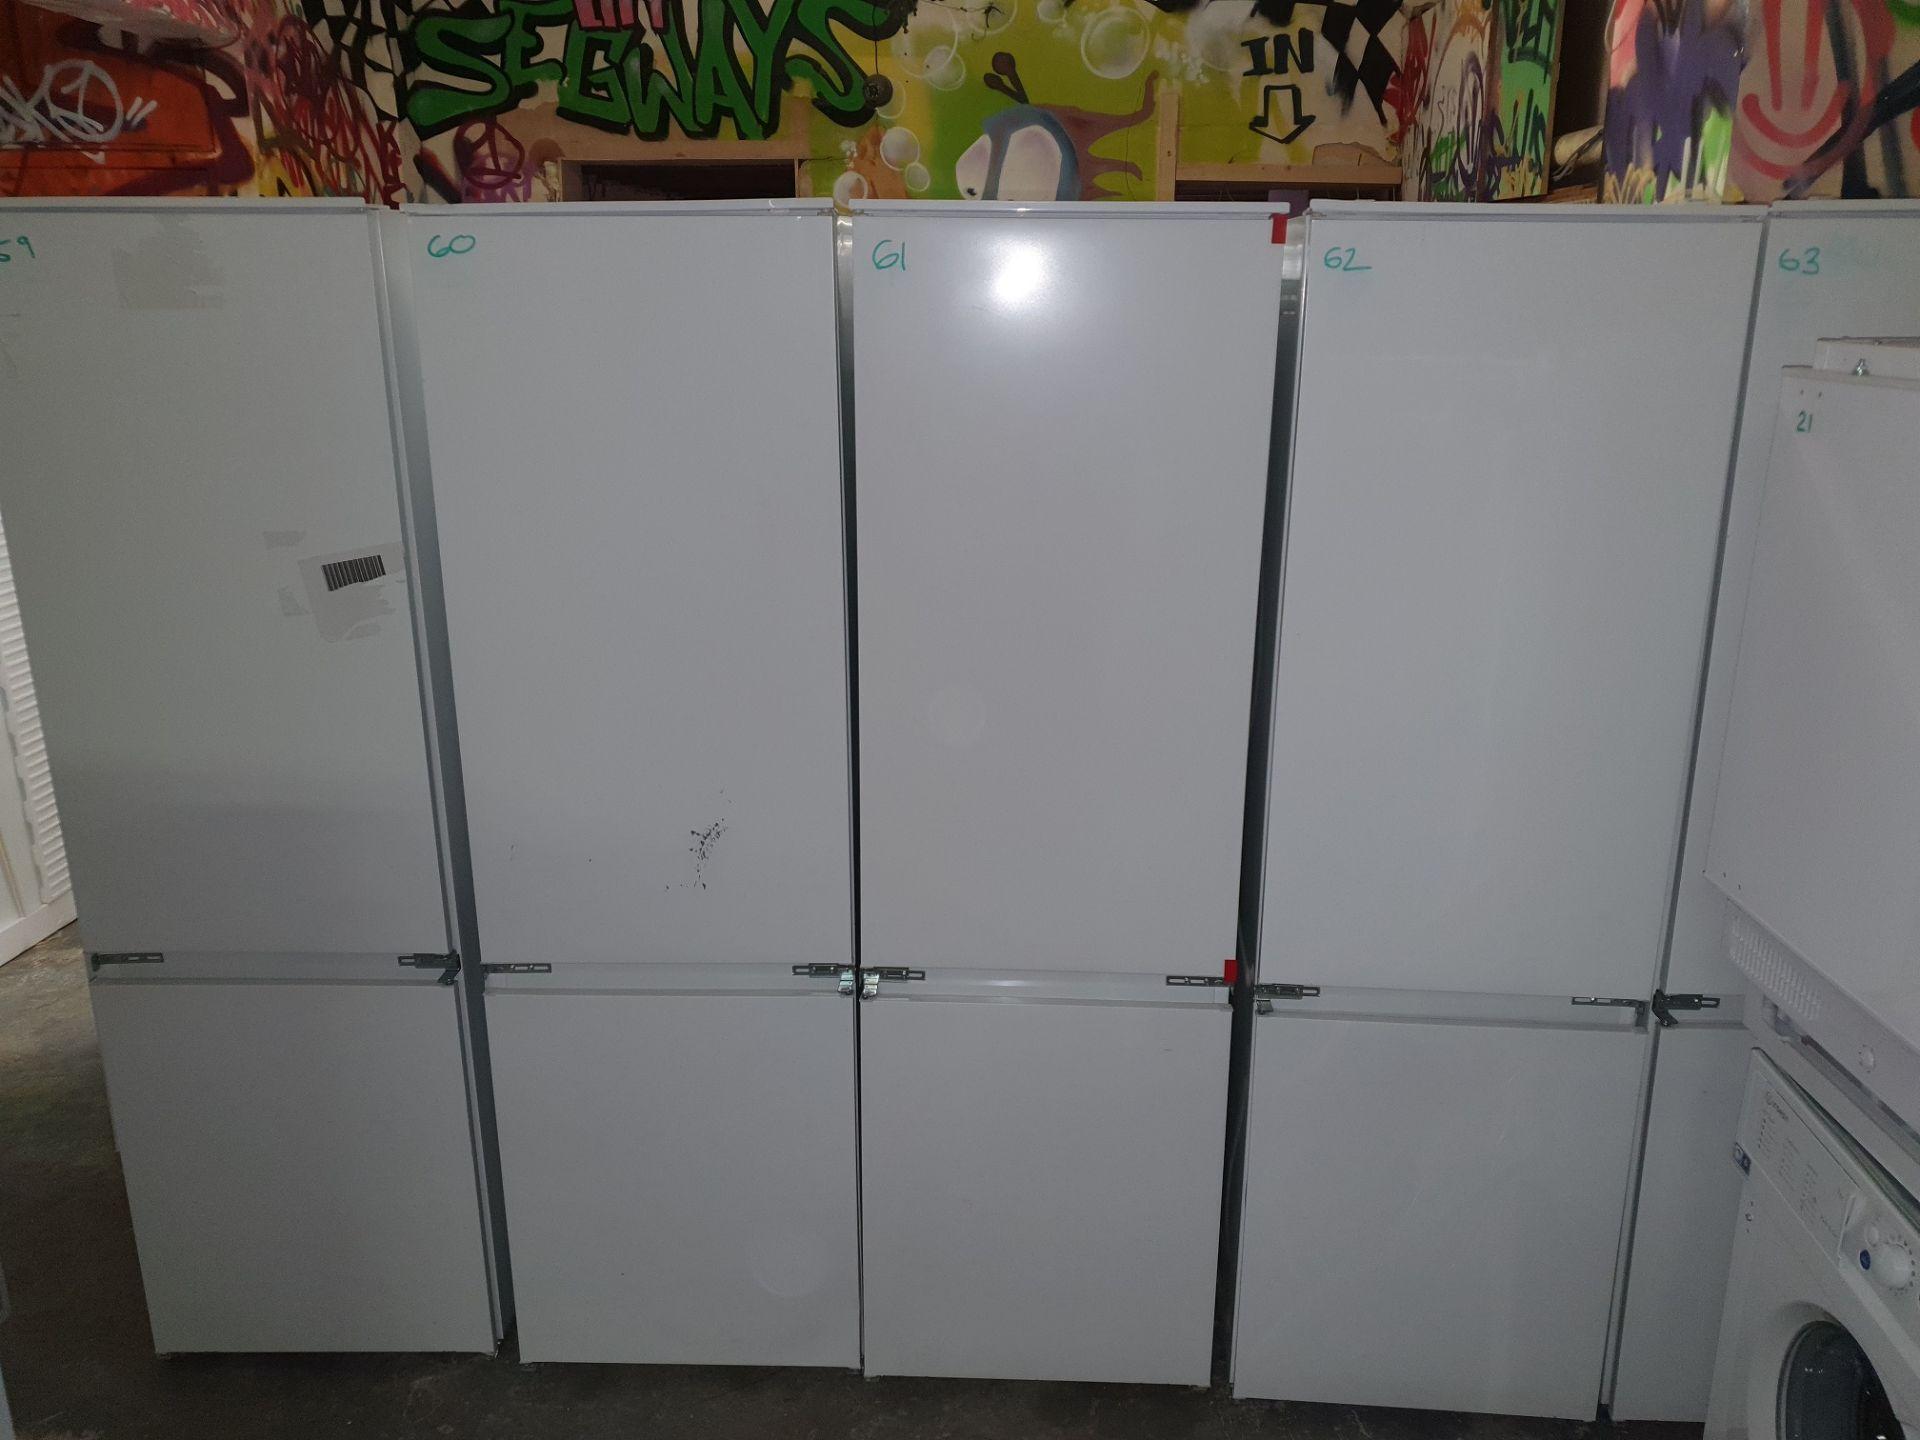 NEW/GRADED AND UNPACKAGED Zanussi ZBB28441SV Integrated 70/30 Fridge Freezer (Brand new slight - Image 2 of 14